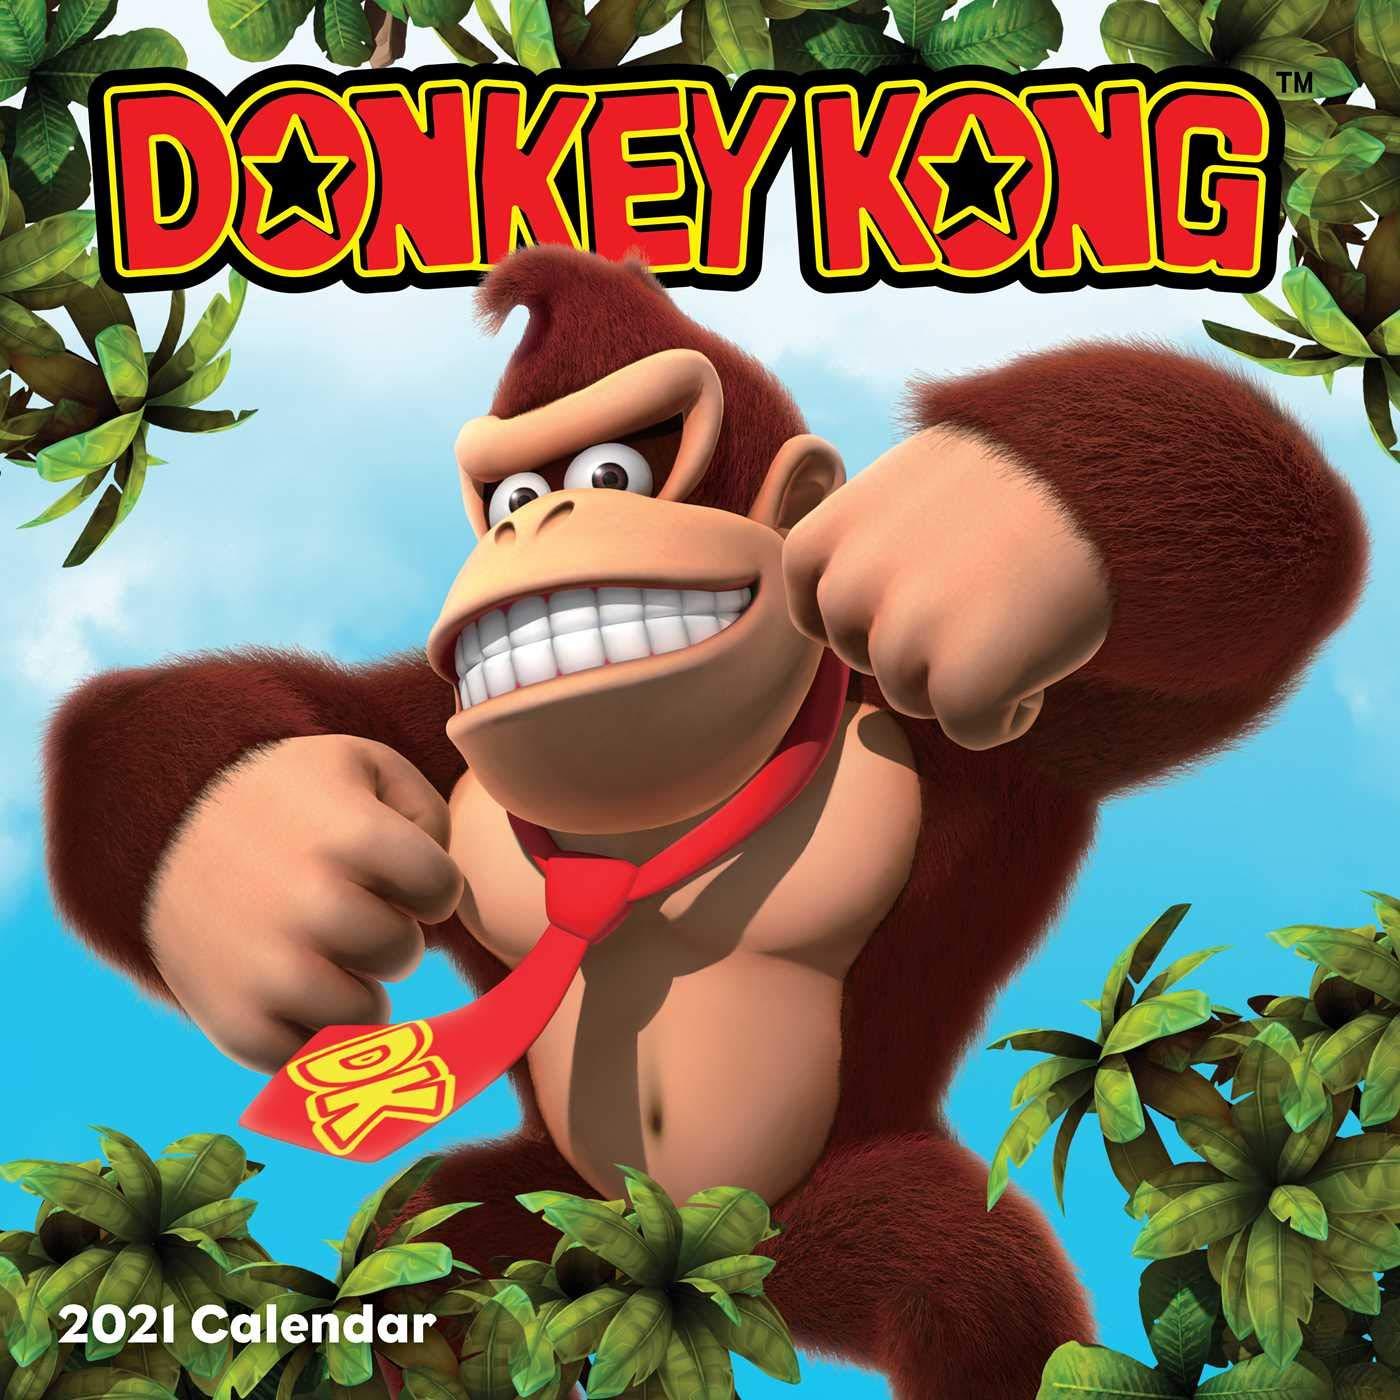 Donkey Kong 2021 Wall Calendar: Nintendo: 9781419744518: Amazon.com: Books